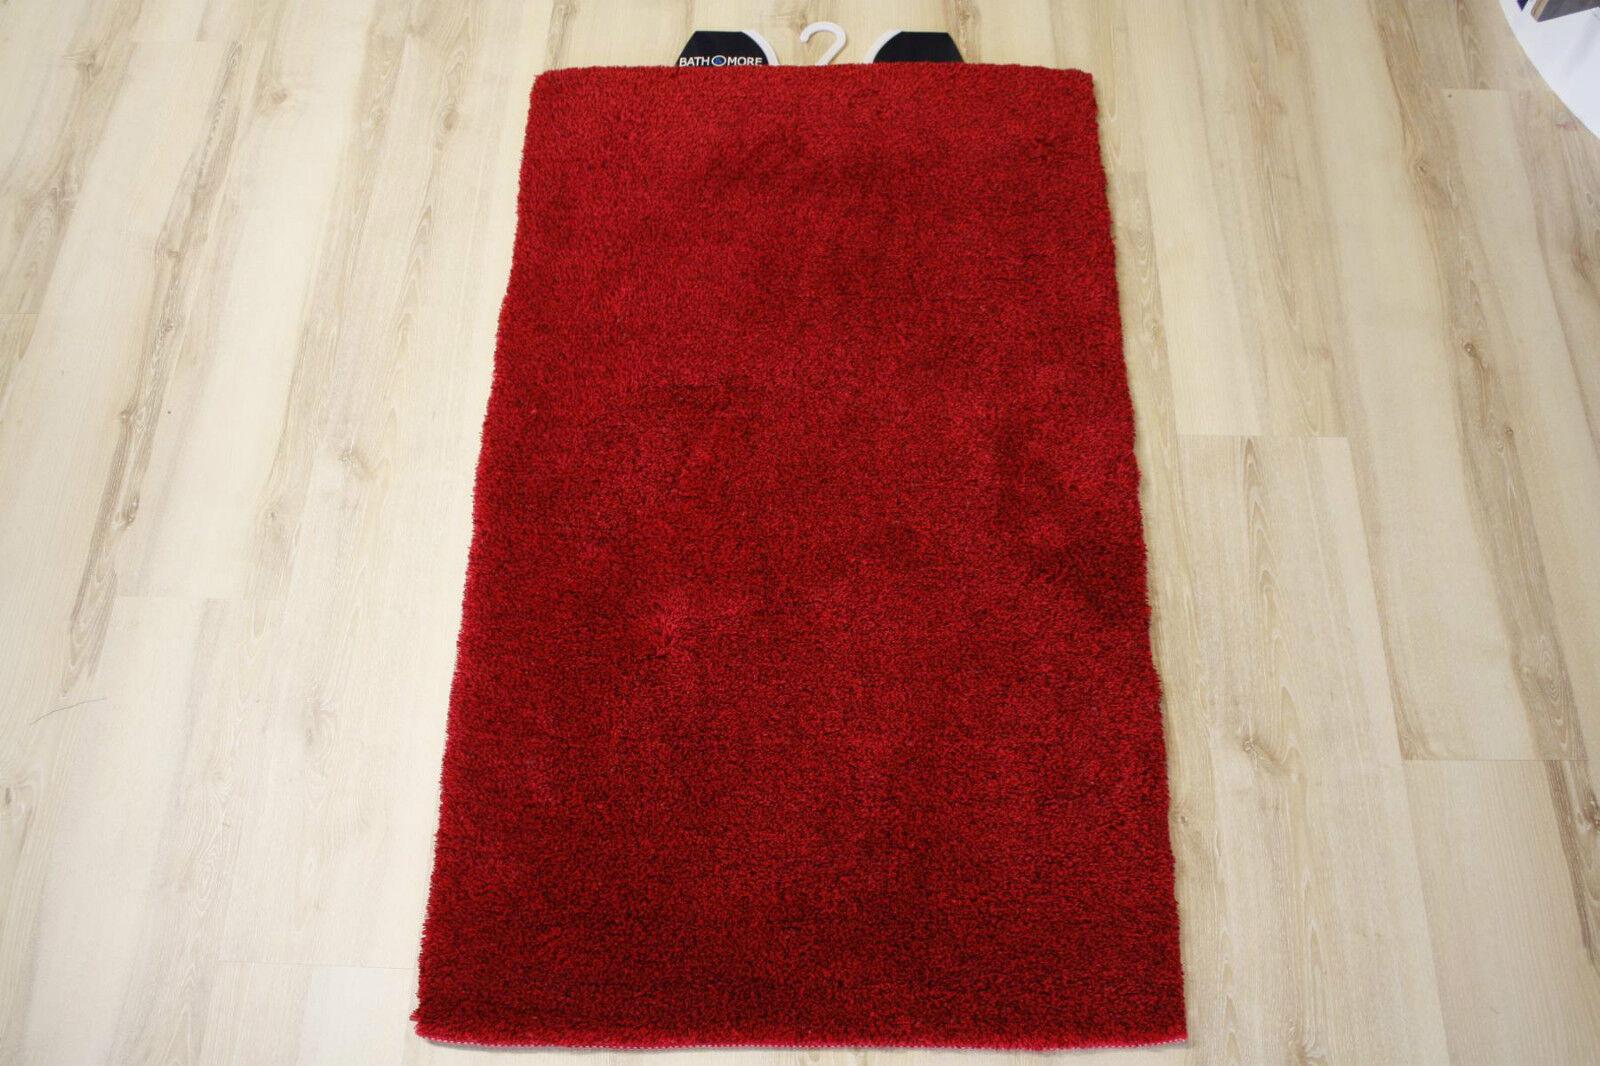 Badteppich Badematte Multi Rot 80x150 cm